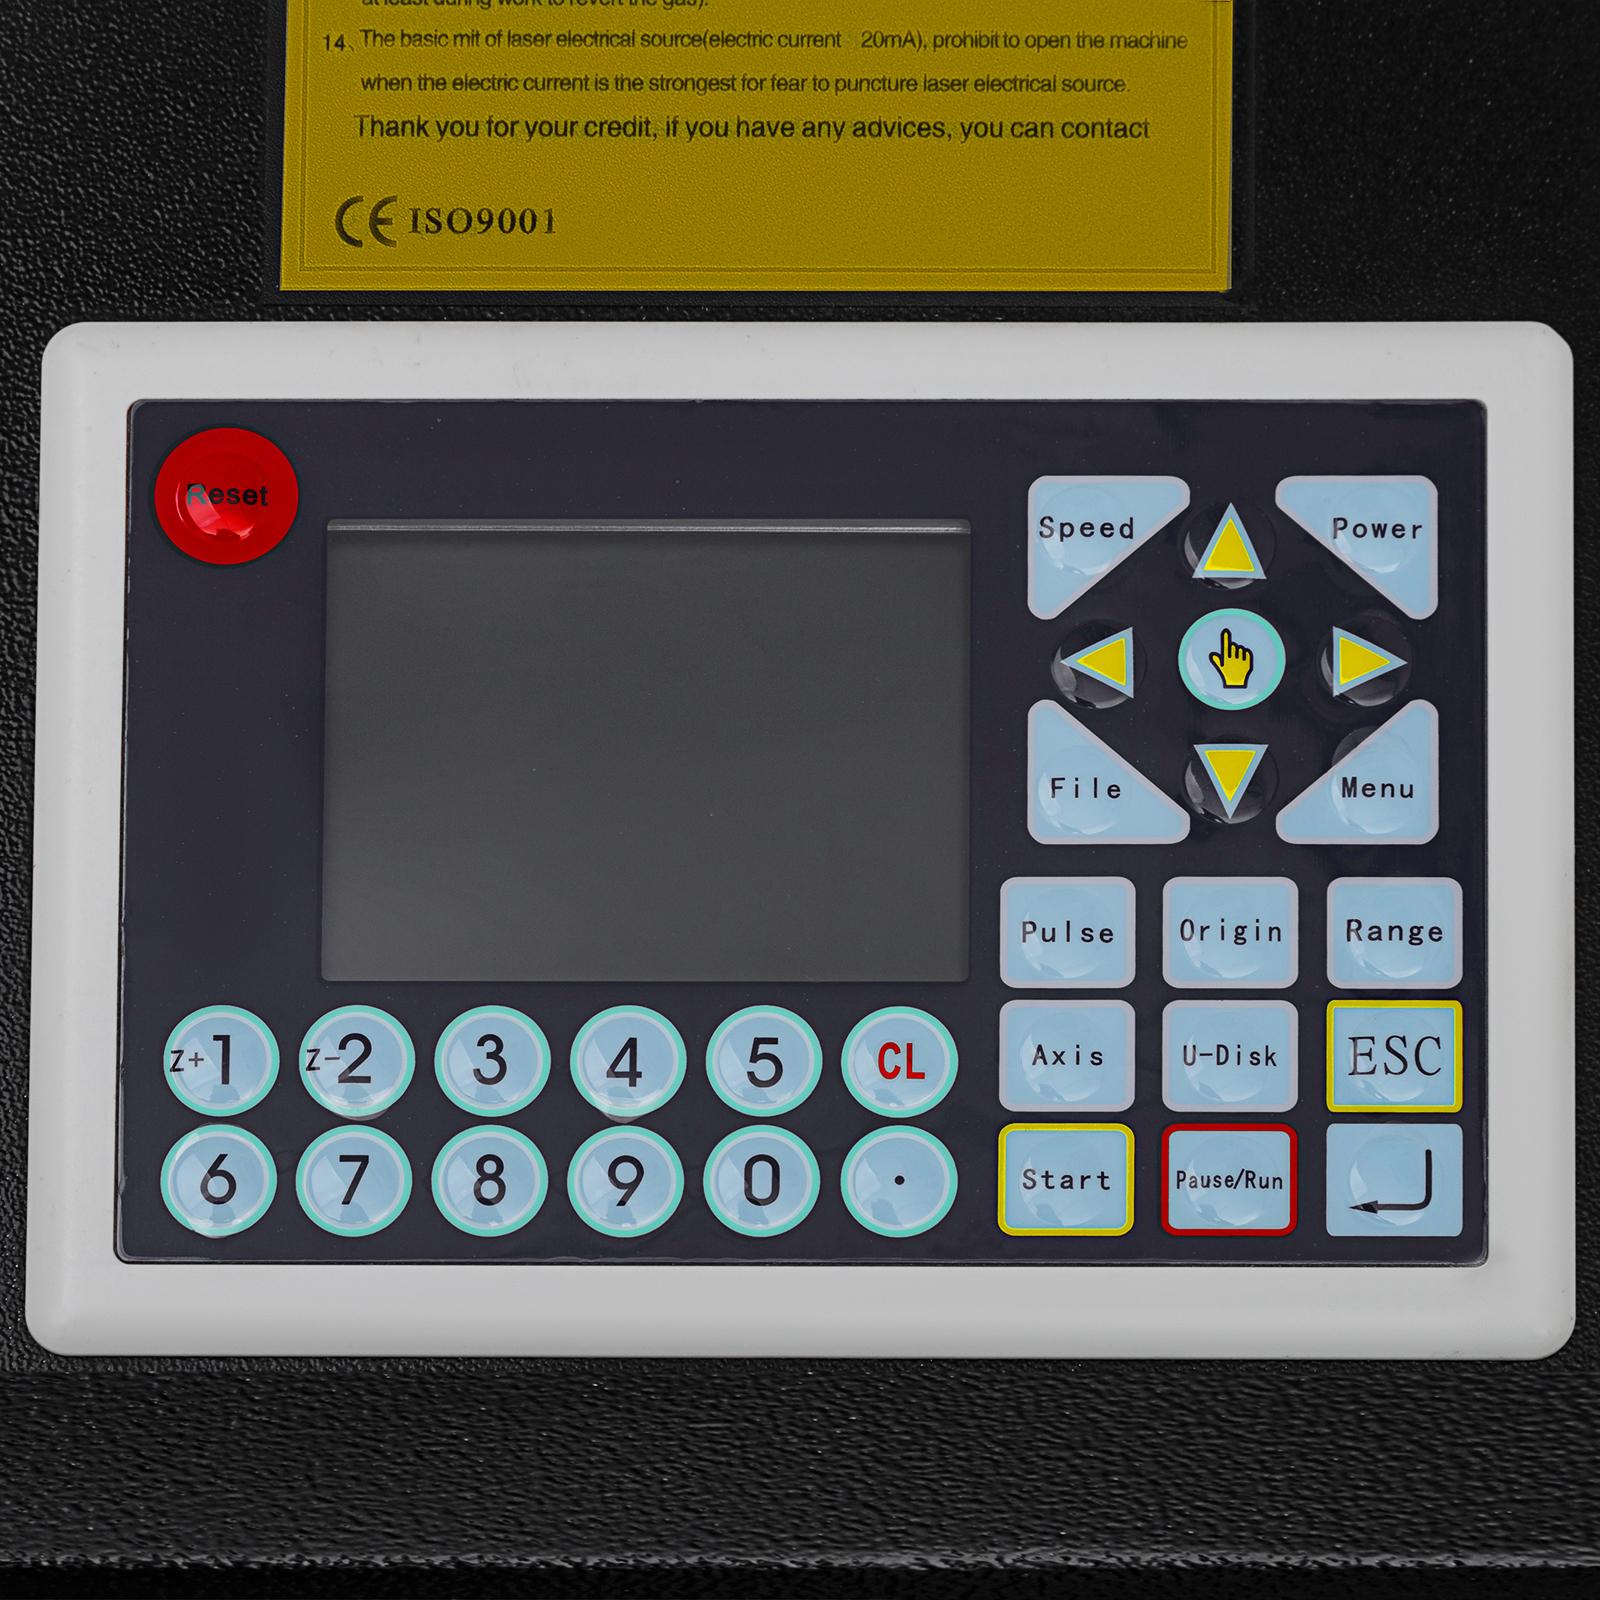 Macchina-per-Incisione-Laser-CO2-40-130W-Asse-Rotante-Tagliatrice-Incisore miniatura 44